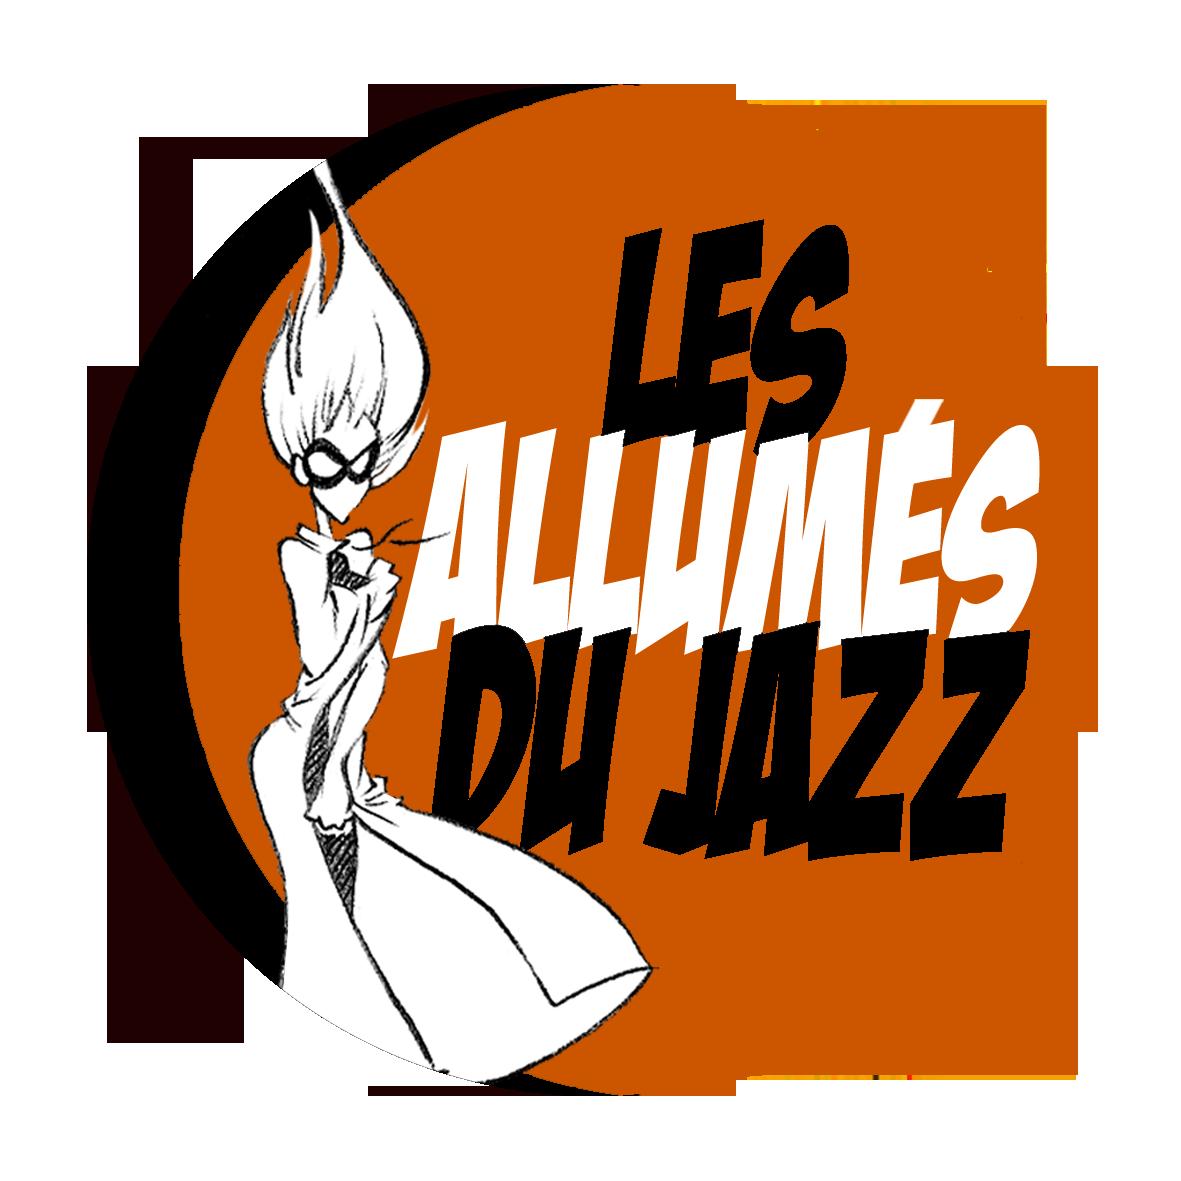 Deuxièmes Rencontres des Allumés du Jazz